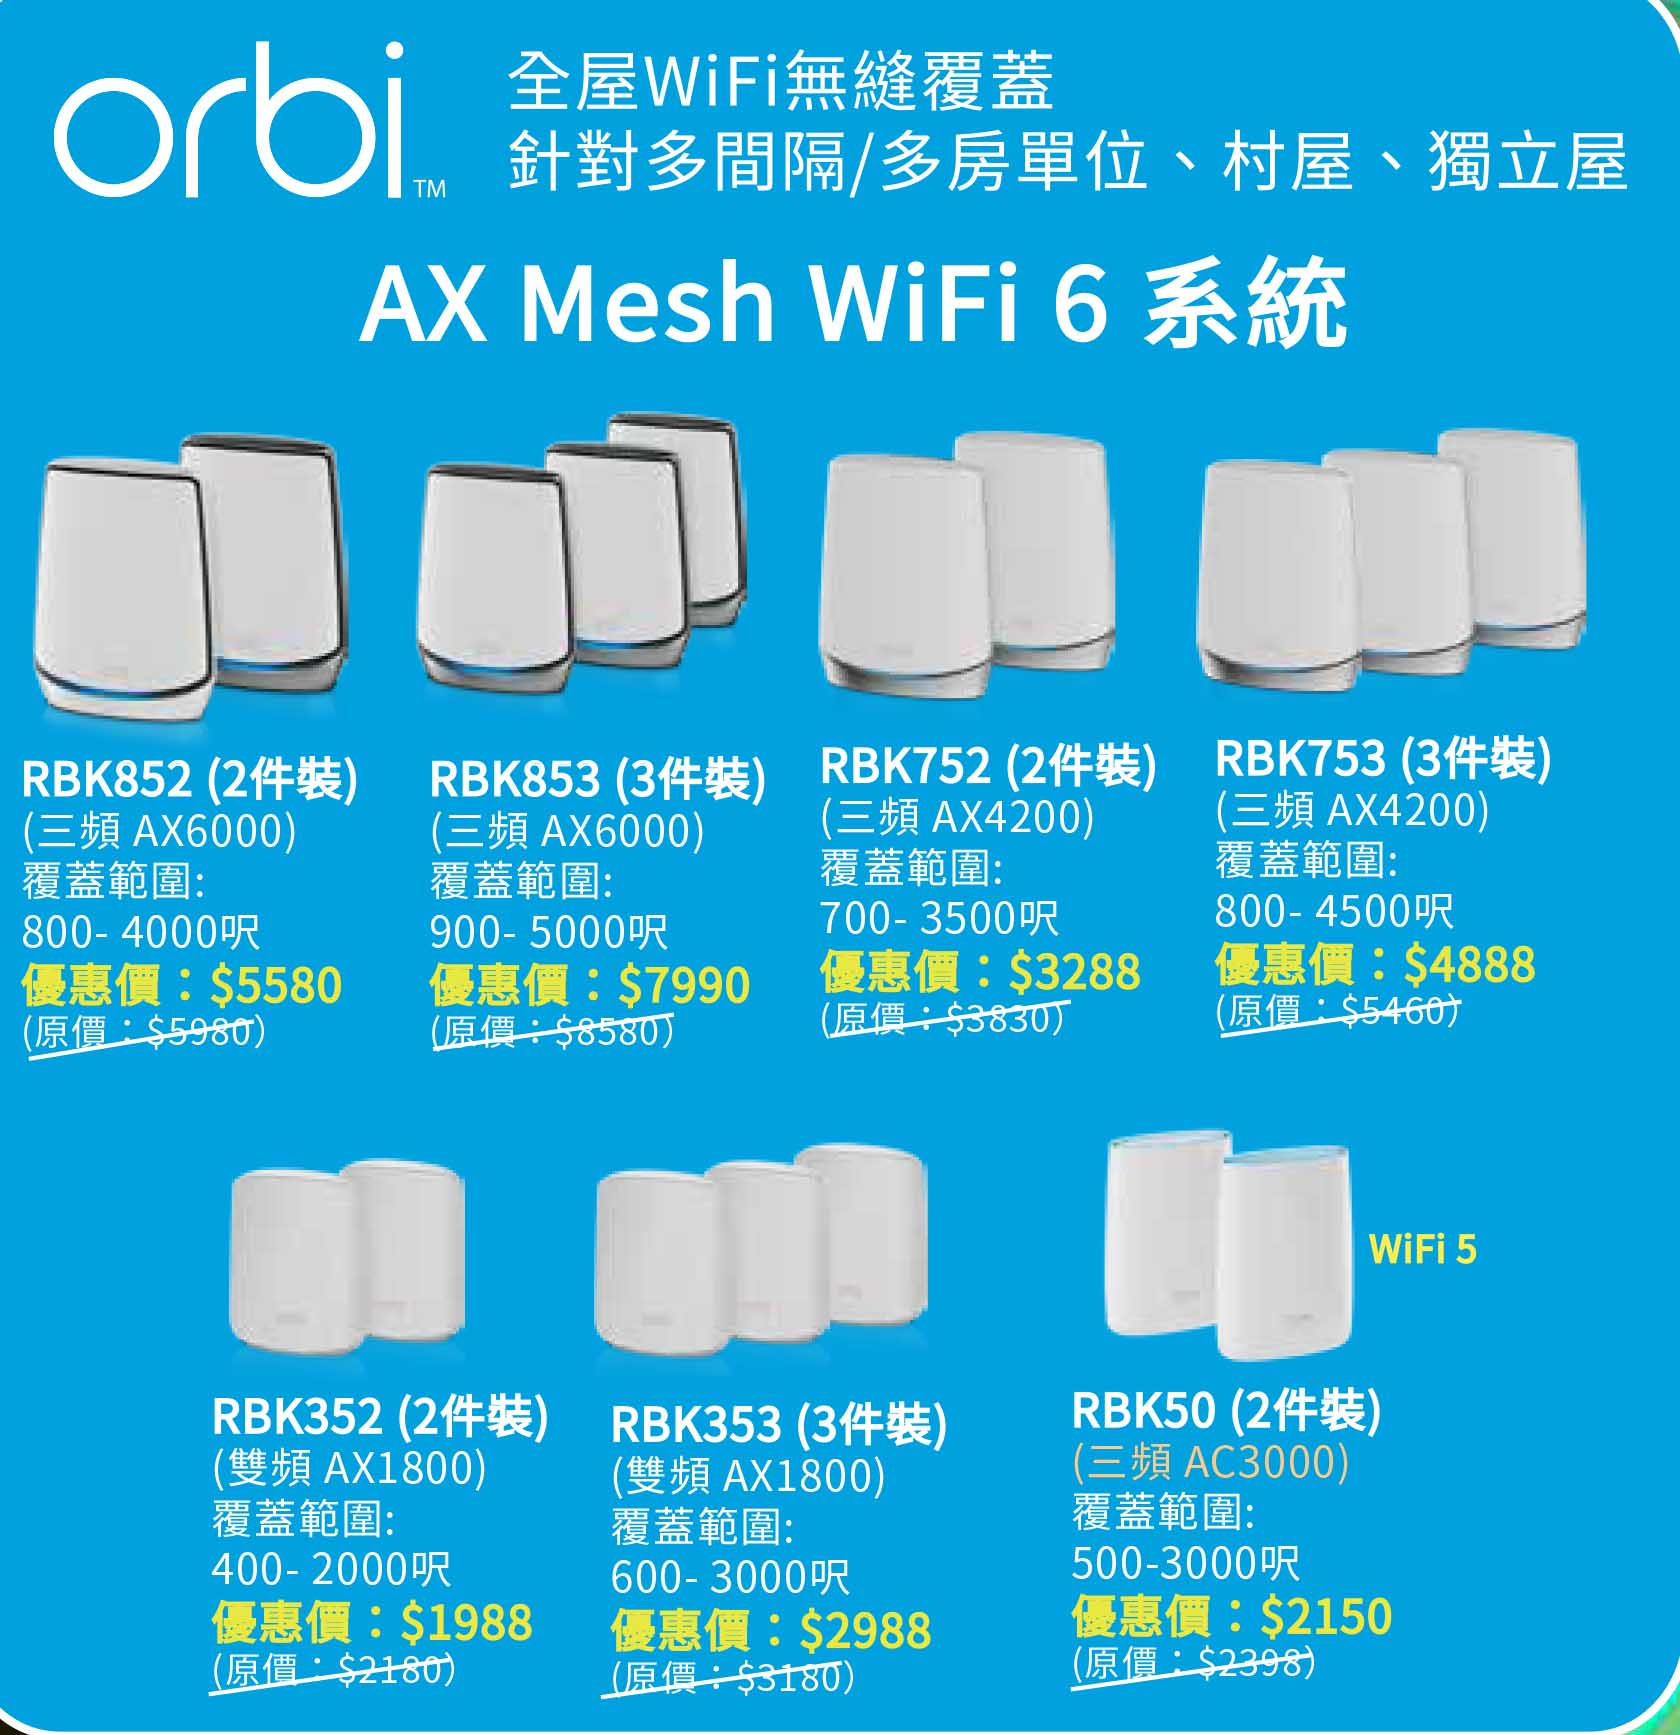 Work from Home 新常態   3 月升級 WiFi NETGEAR 最新優惠